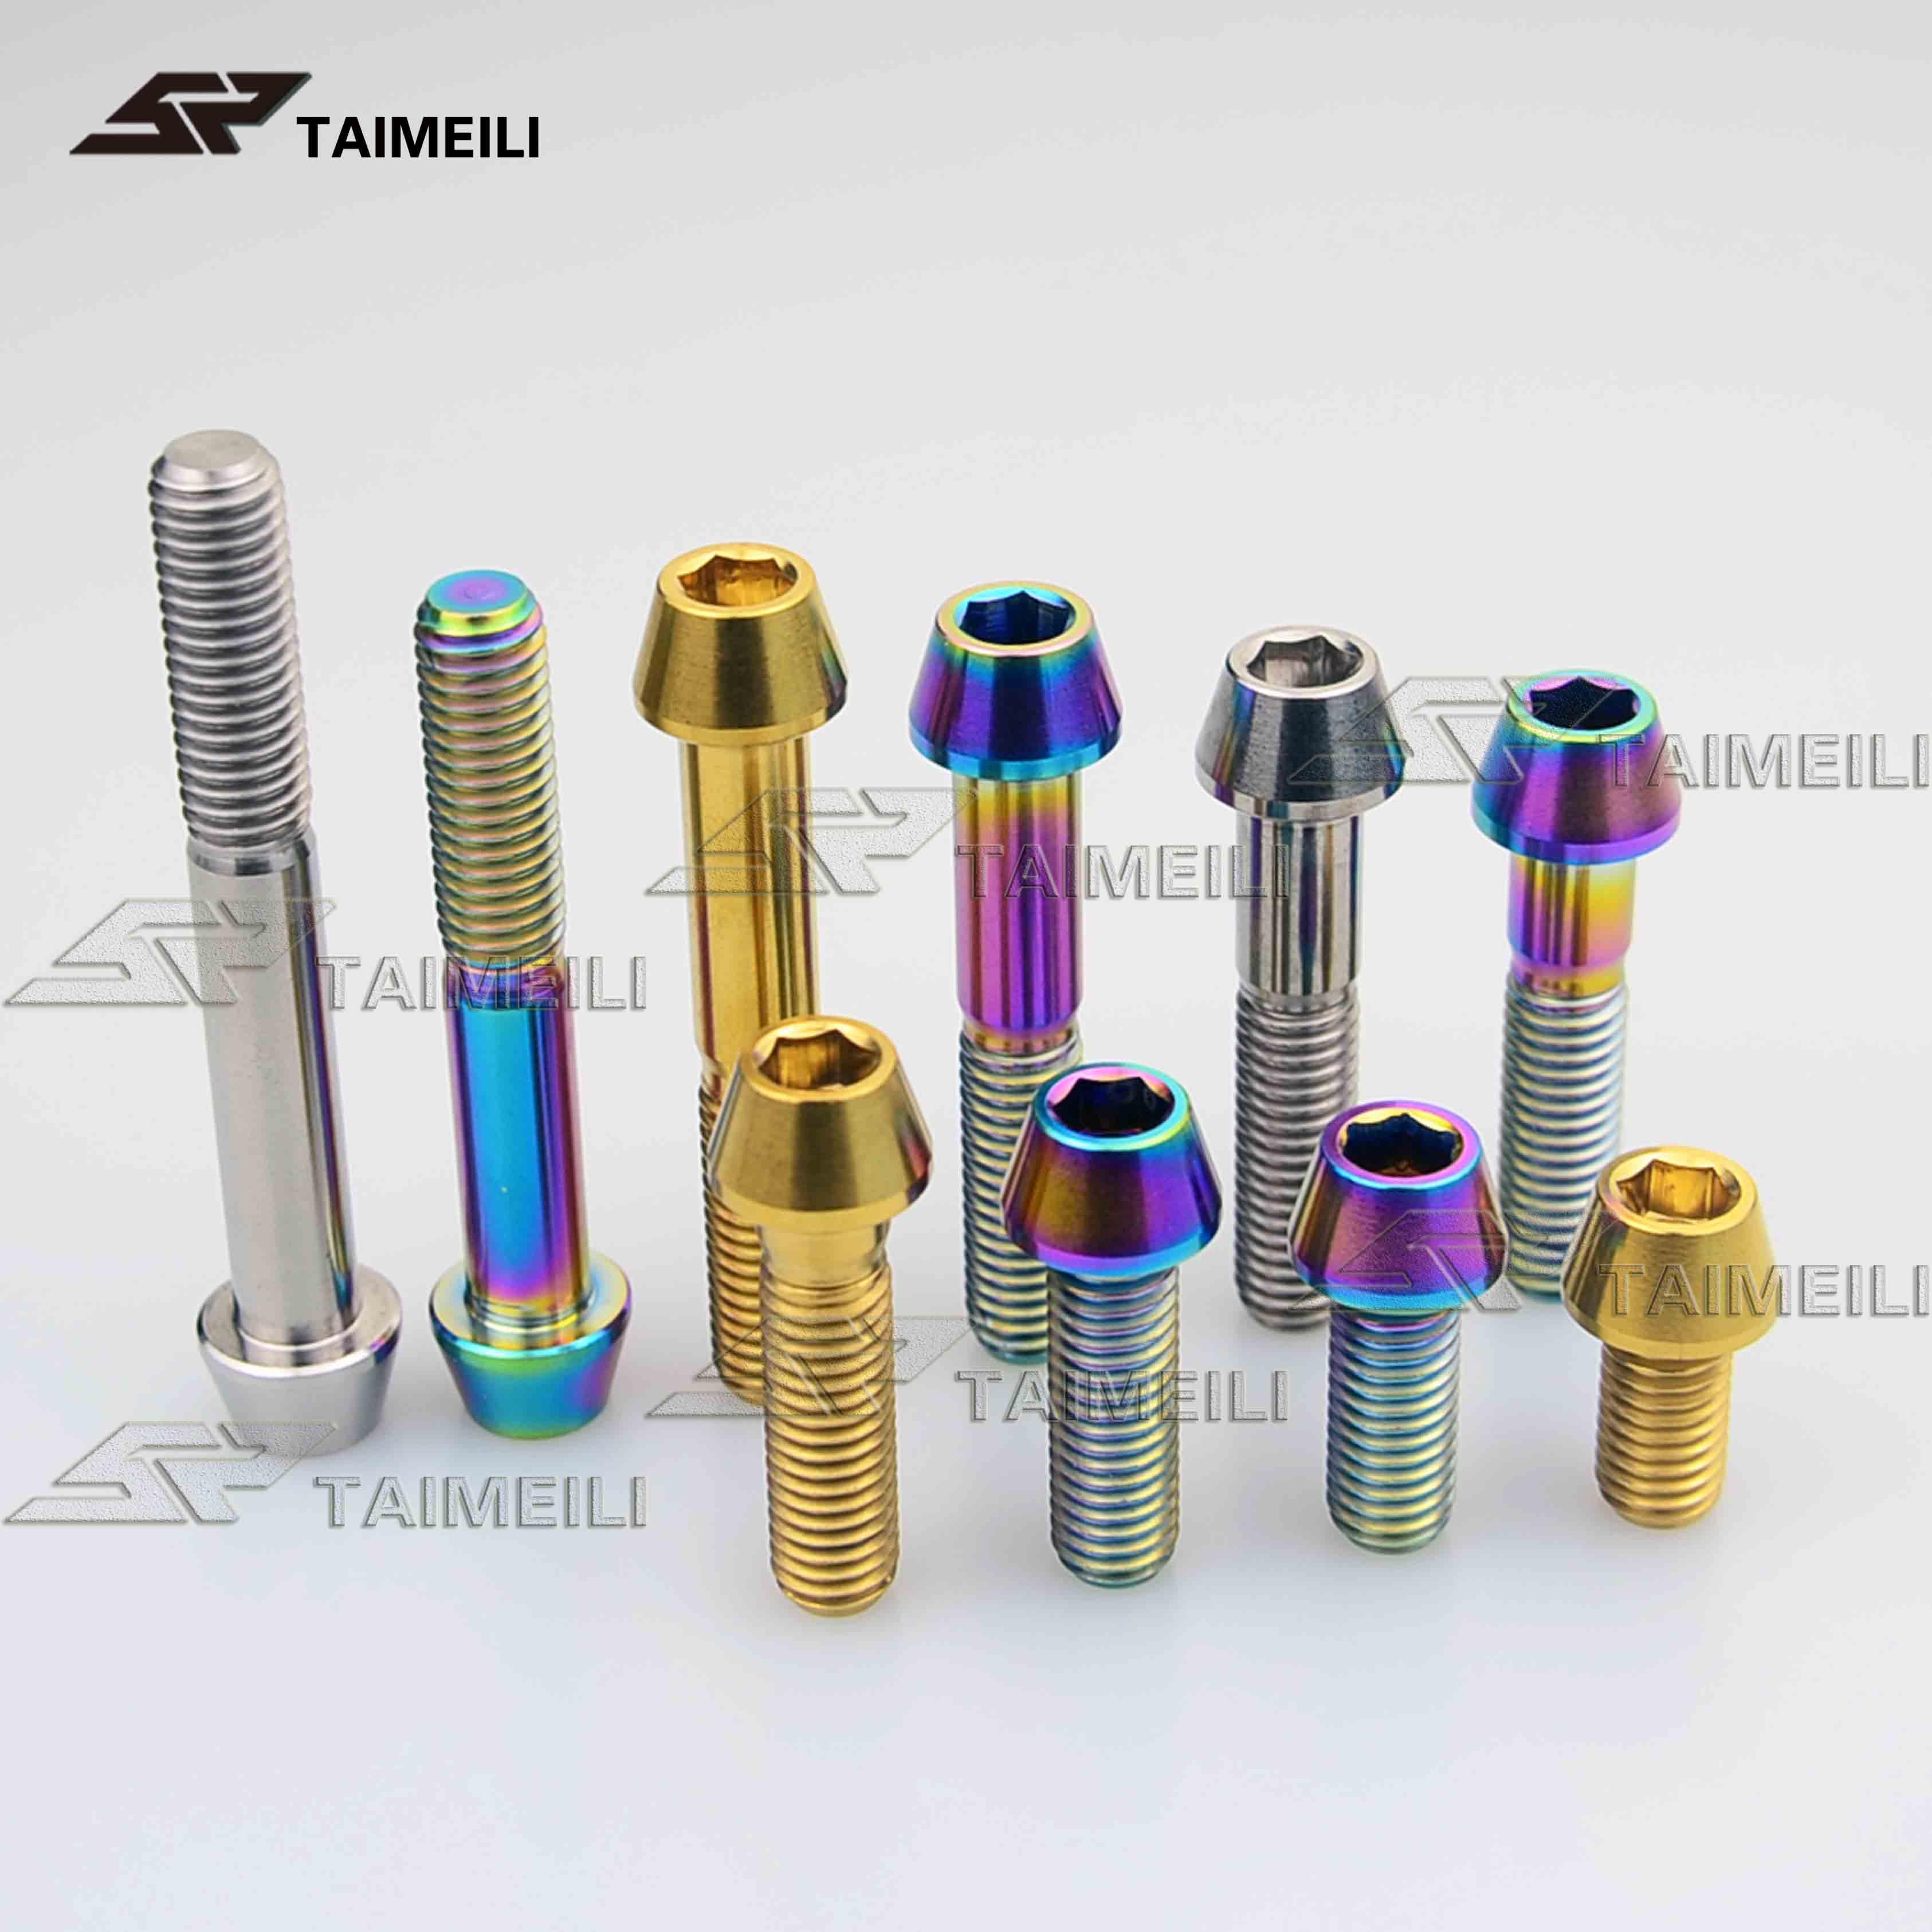 M10 Titanium Ti Taper Cone Socket Allen Bolts 20 25 30 35 40 45 50 55 60 65 70